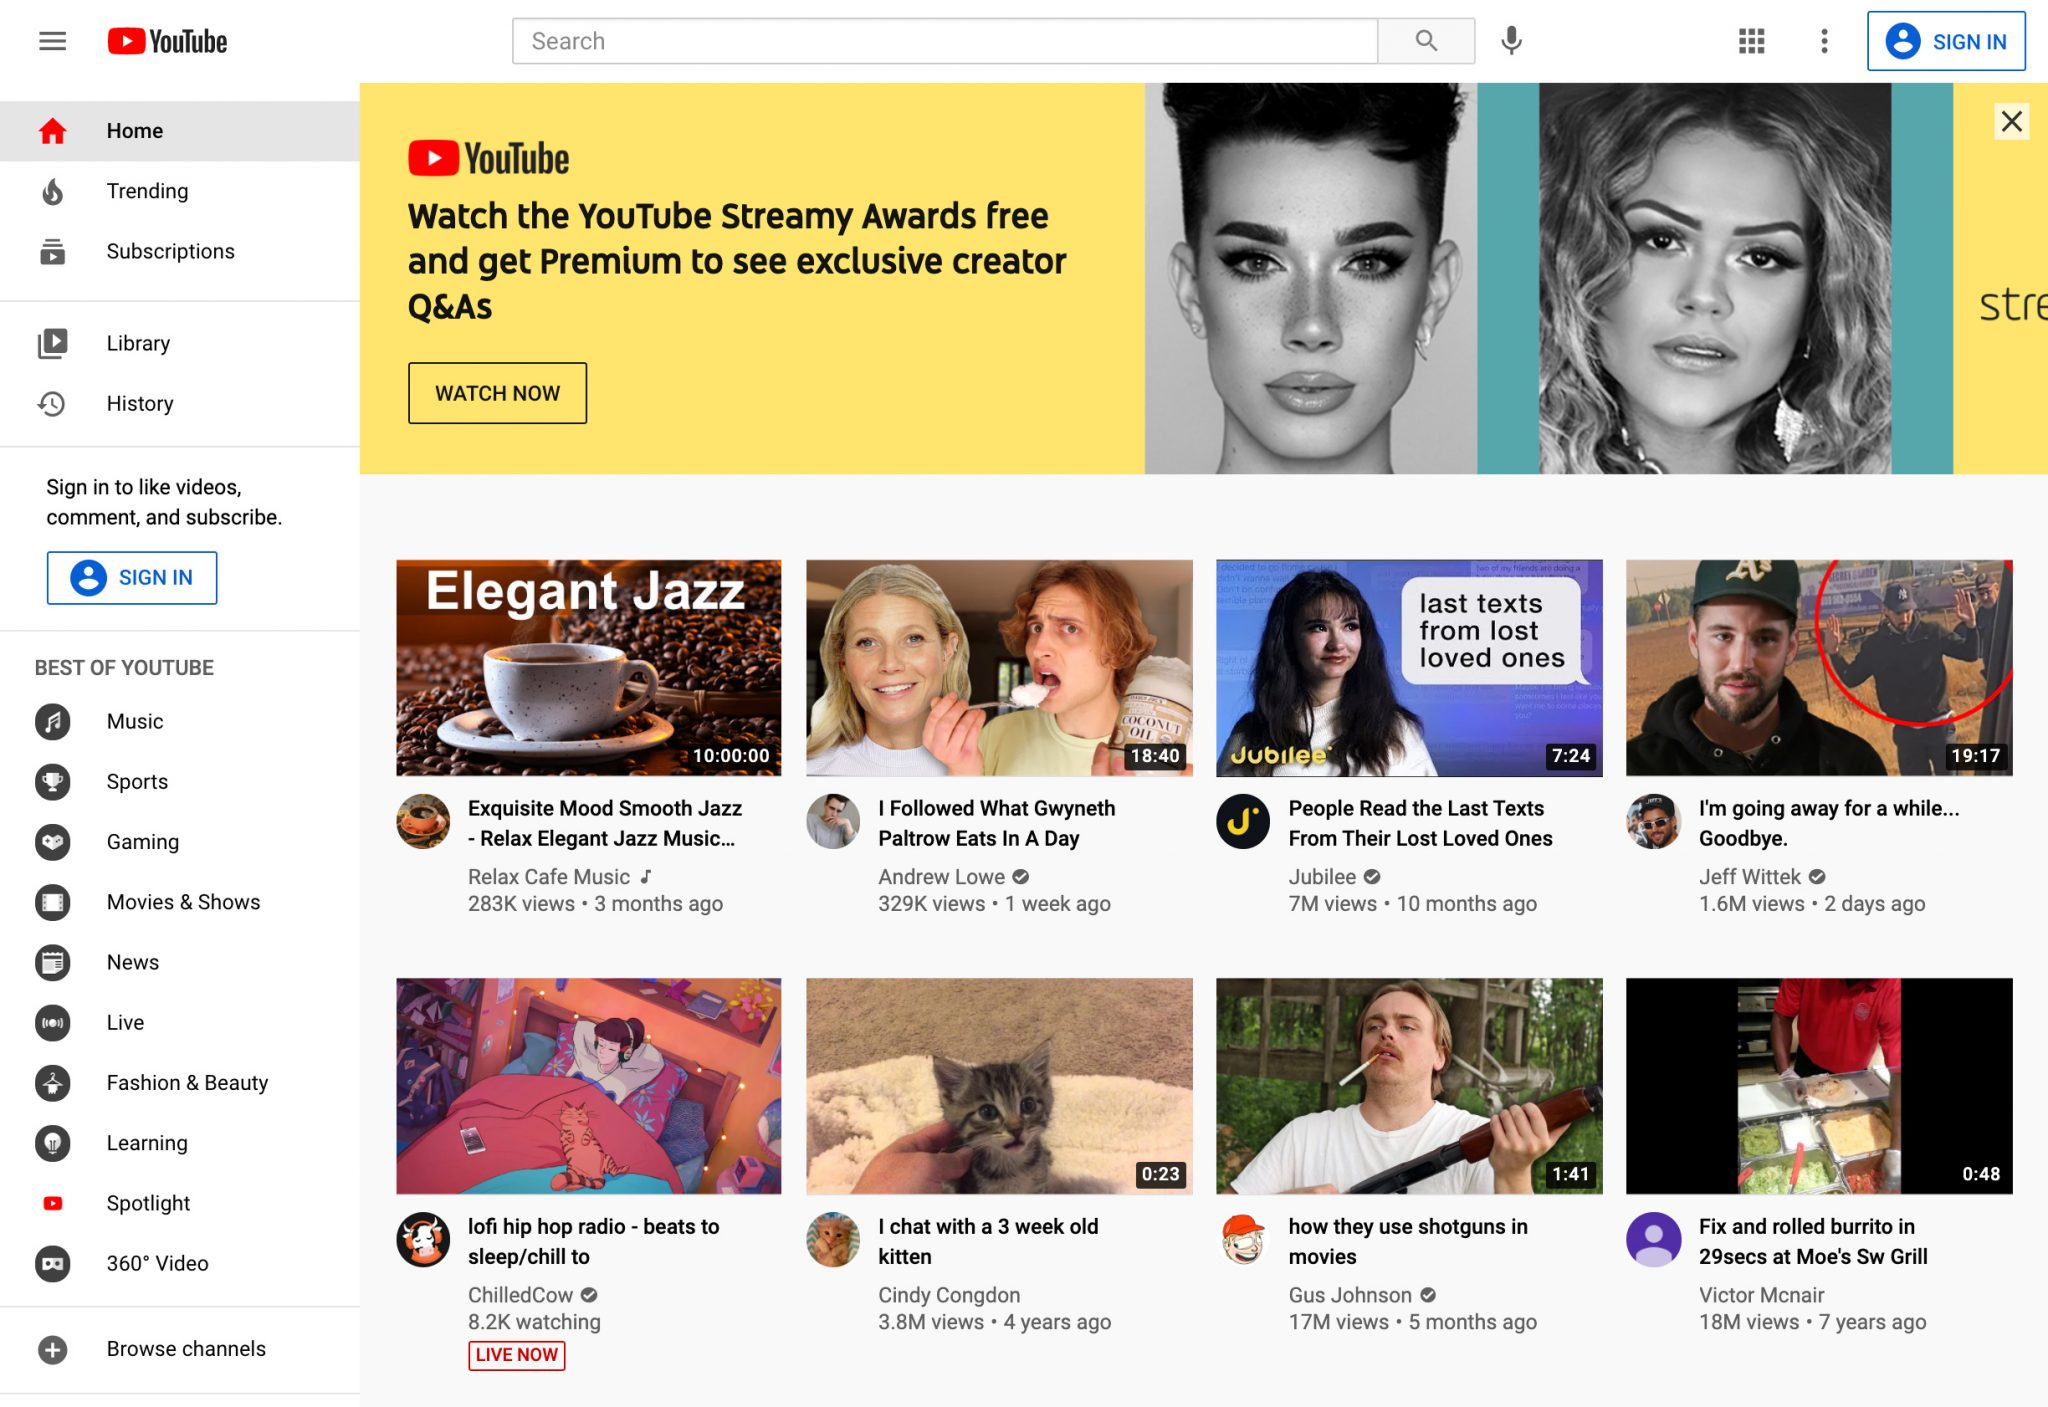 youtube homepage videos